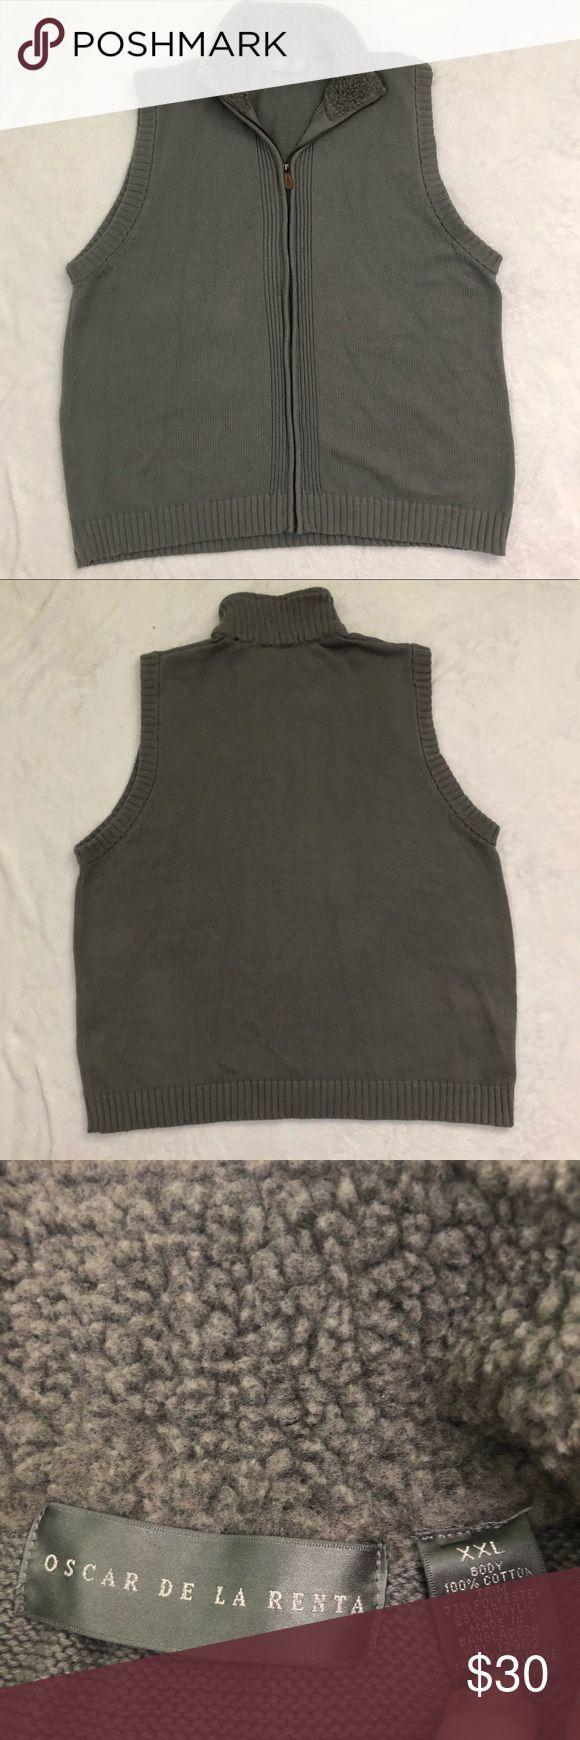 Oscar de la Renta Zip-up Vest XXL Faux Fur Lined Size 2x  Grey zip up style  Faux fur collar  Knit sweater material Oscar de la Renta Jackets & Coats Vests